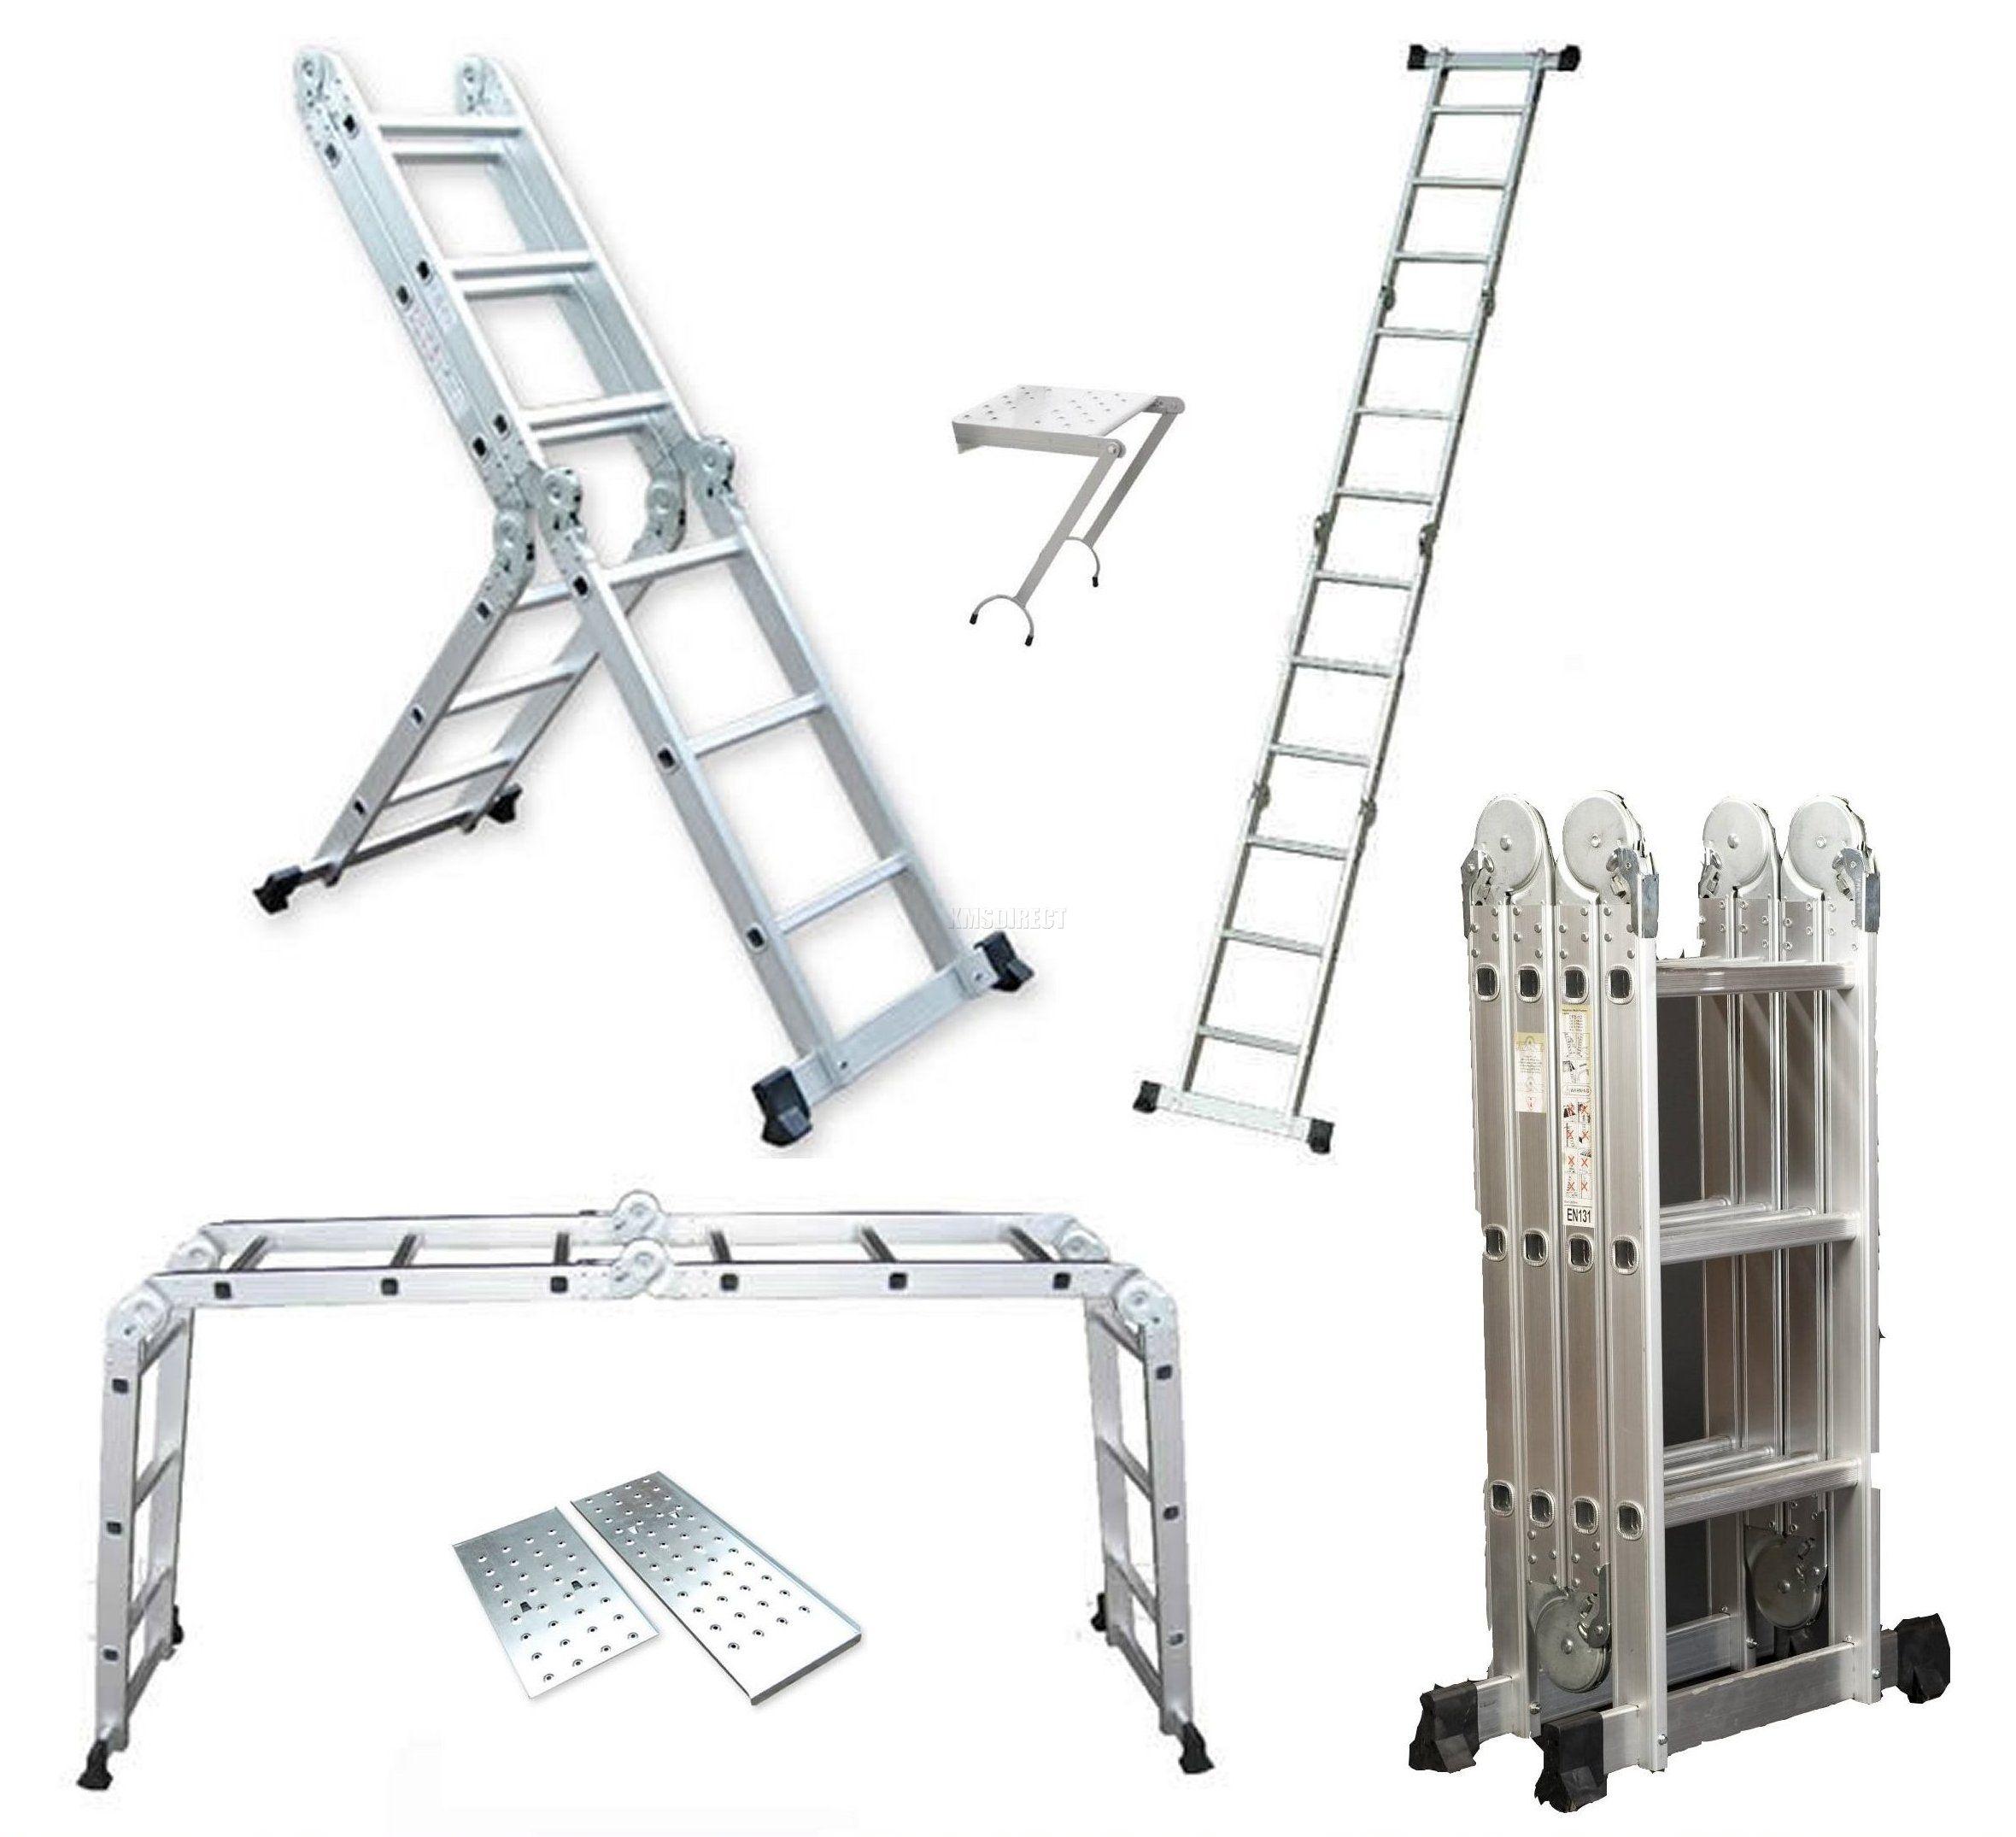 Ladder Scaffold Platform : M multi purpose aluminium extension scaffold ladder